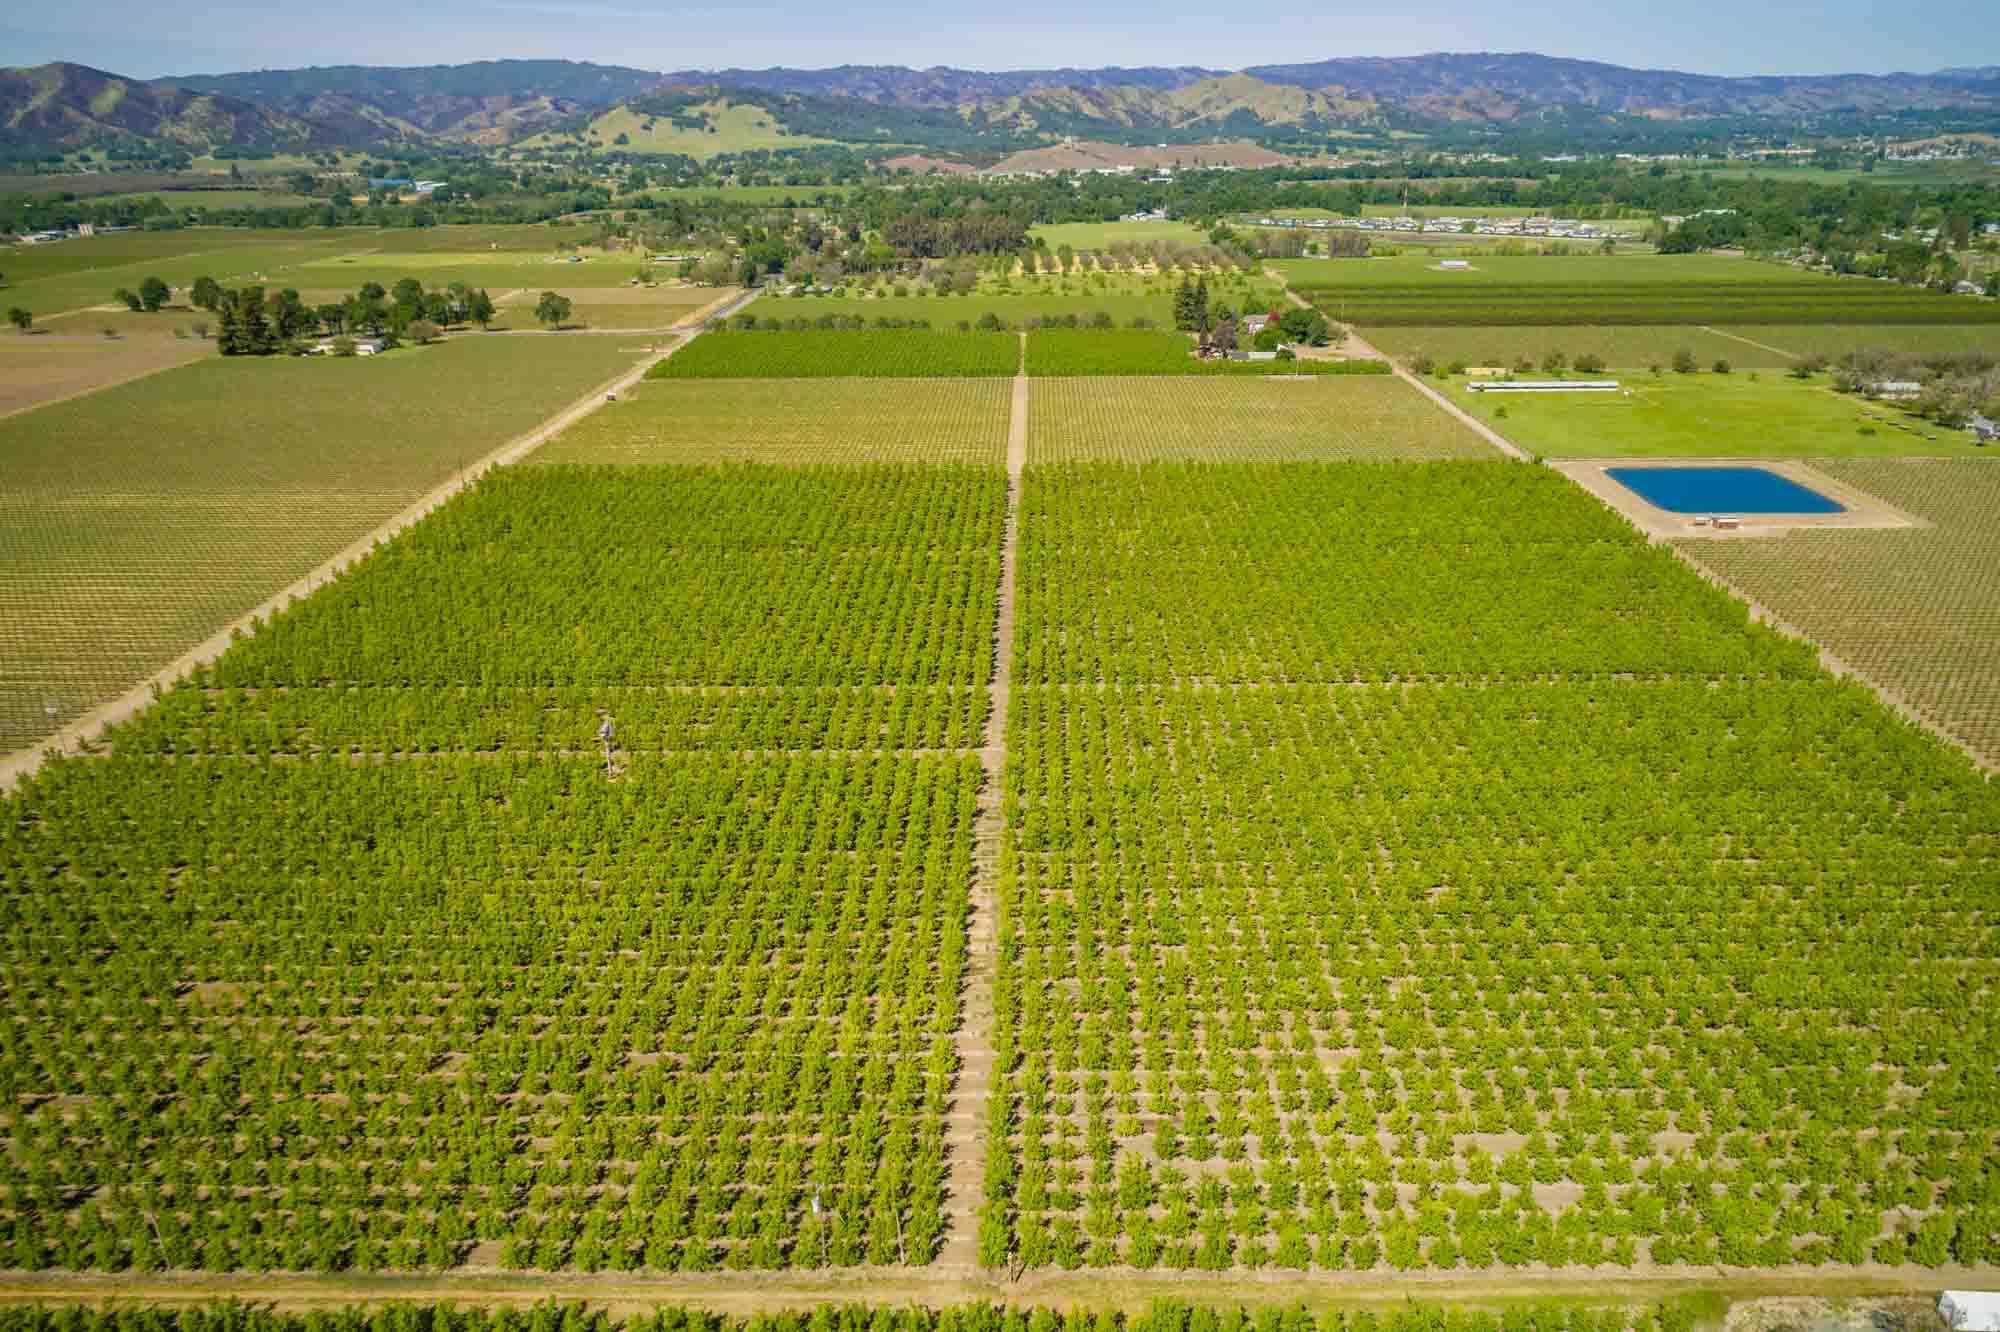 California, ,Vineyards,Commercial,1010015904 MLS # 1010015904